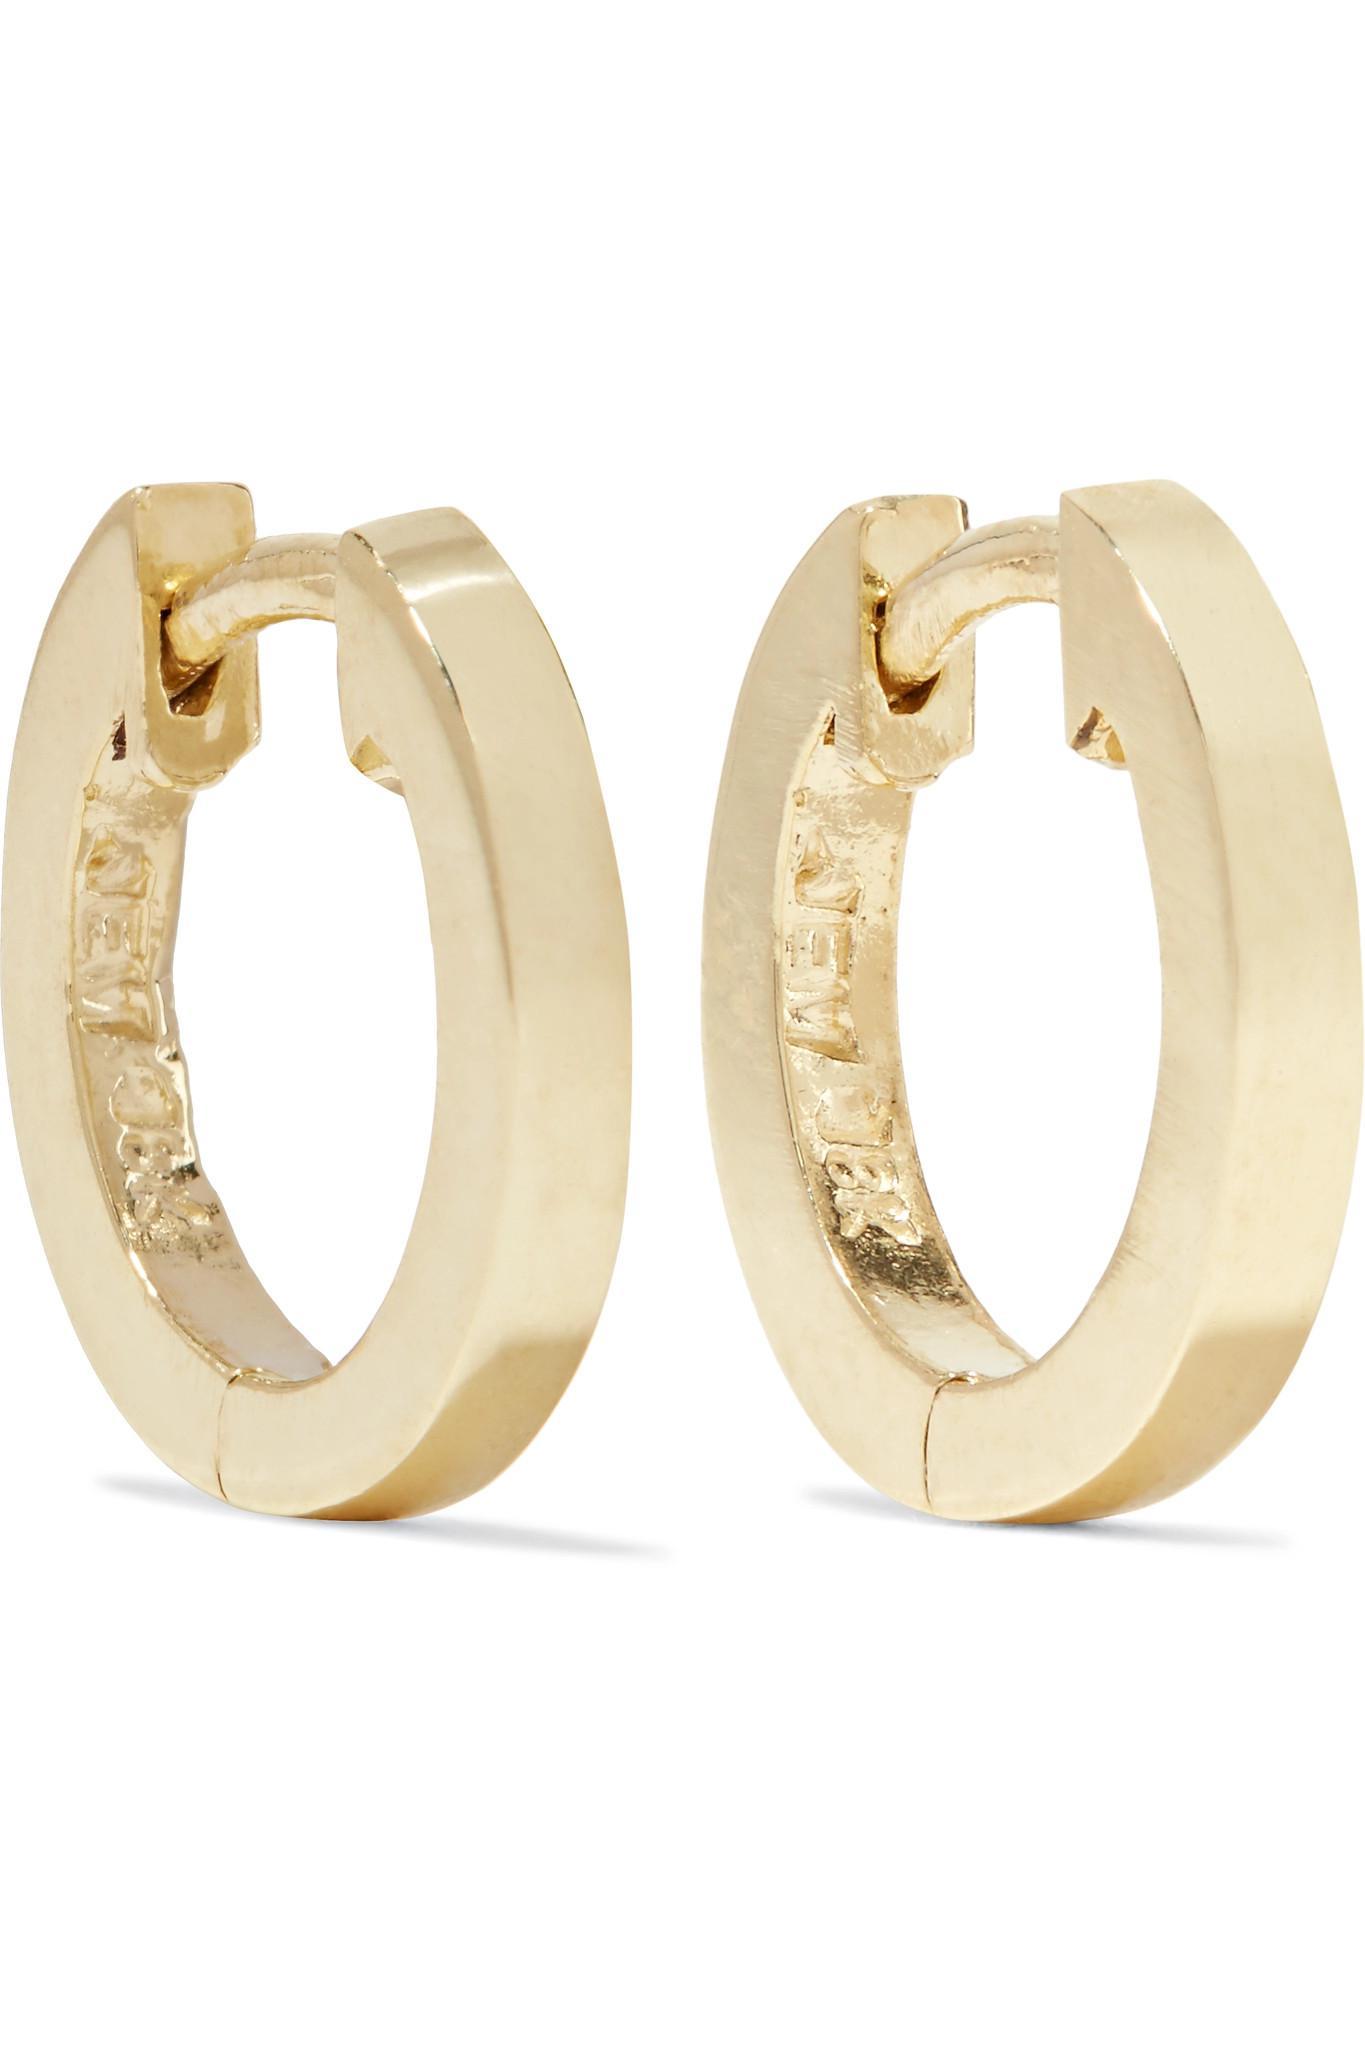 Jennifer Meyer Huggy Small 18-karat Gold Hoop Earrings HrXsz4COq